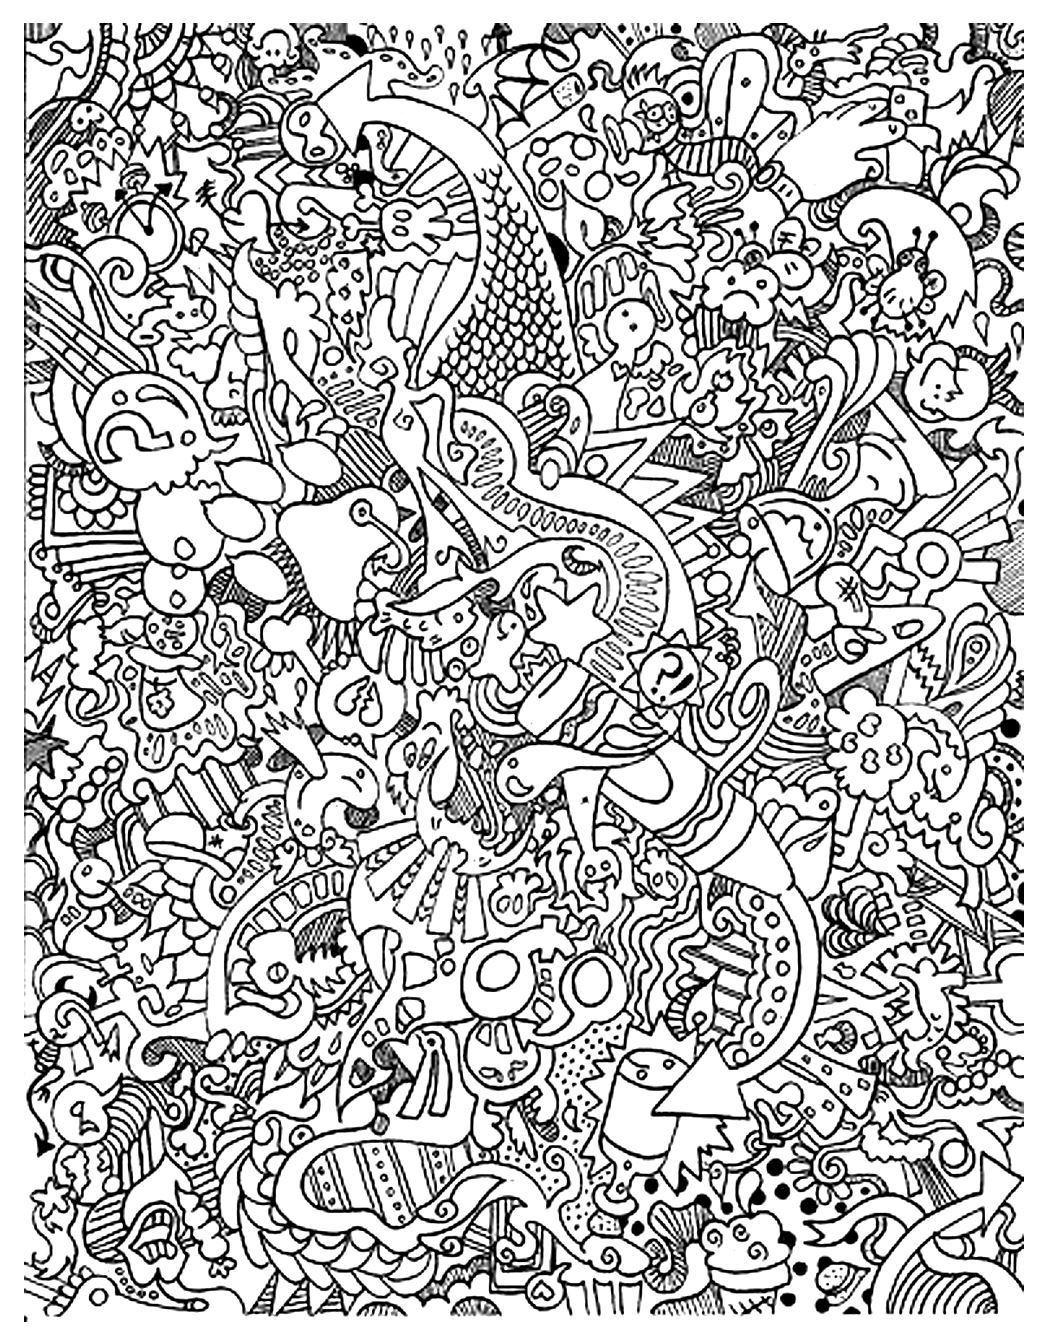 Doodling gribouillage doodle art 6 coloriage doodle art - Coloriage art ...